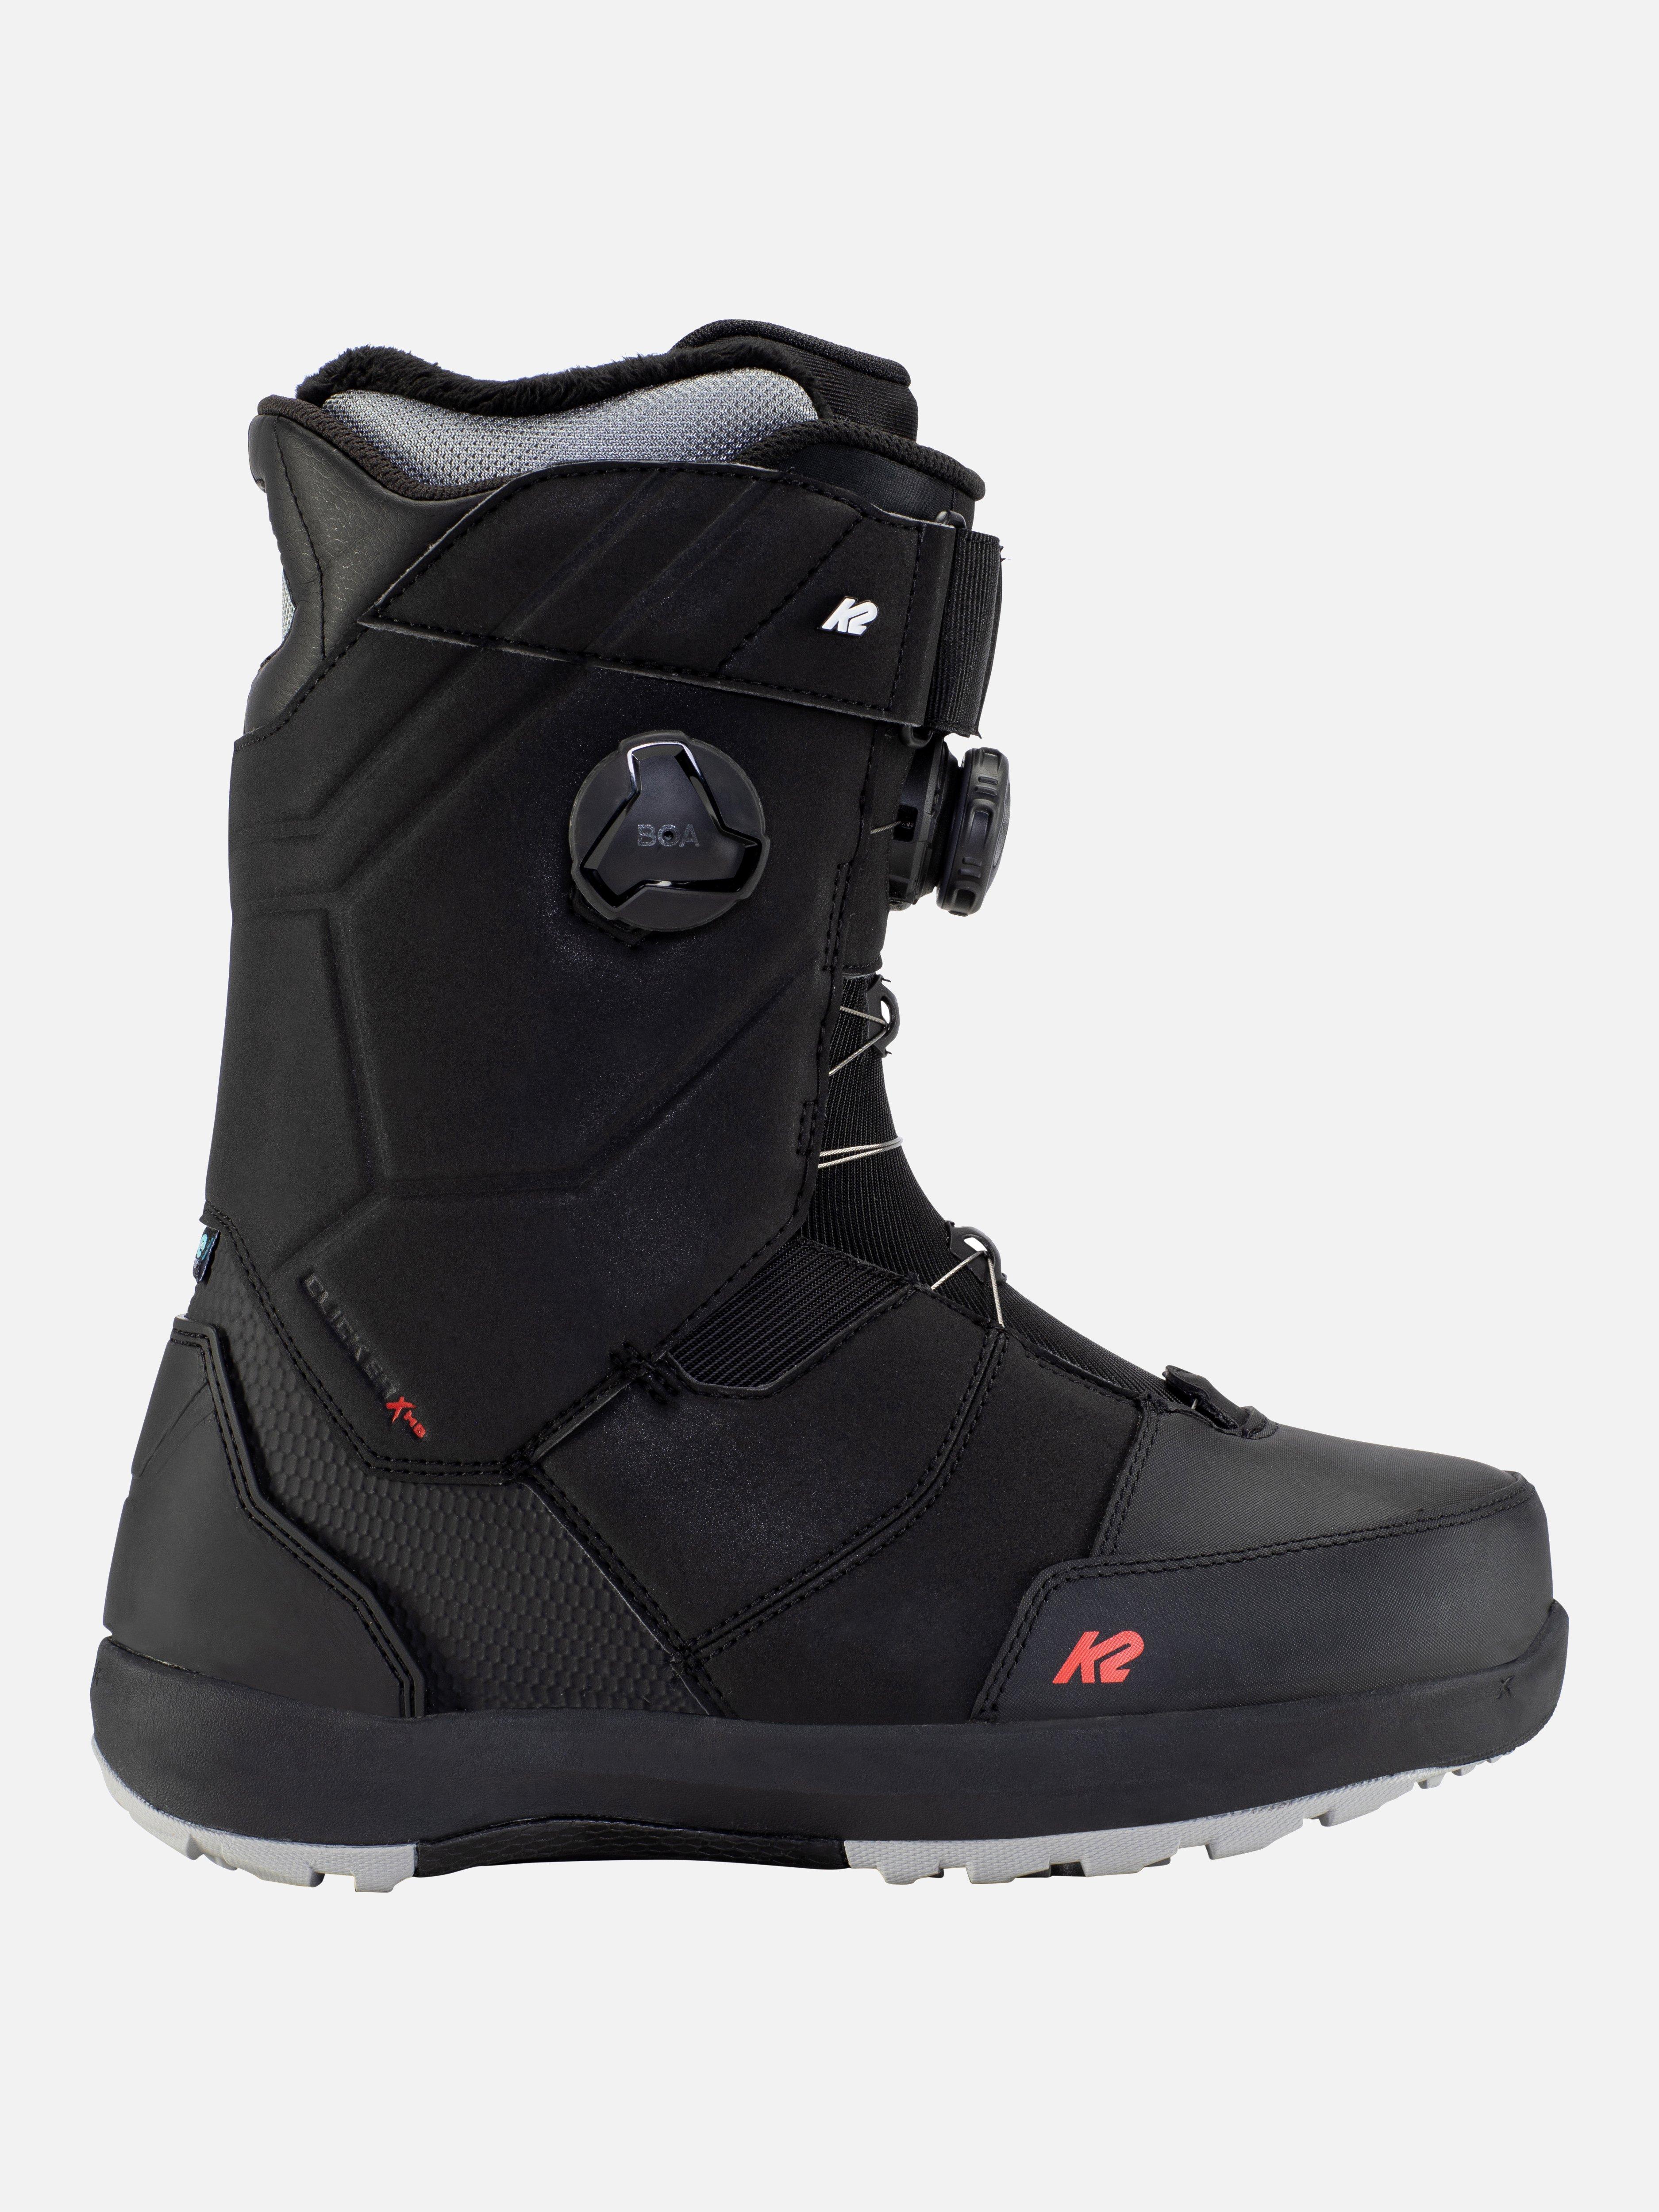 K2 Boundary Clicker X HB Snowboard Boot